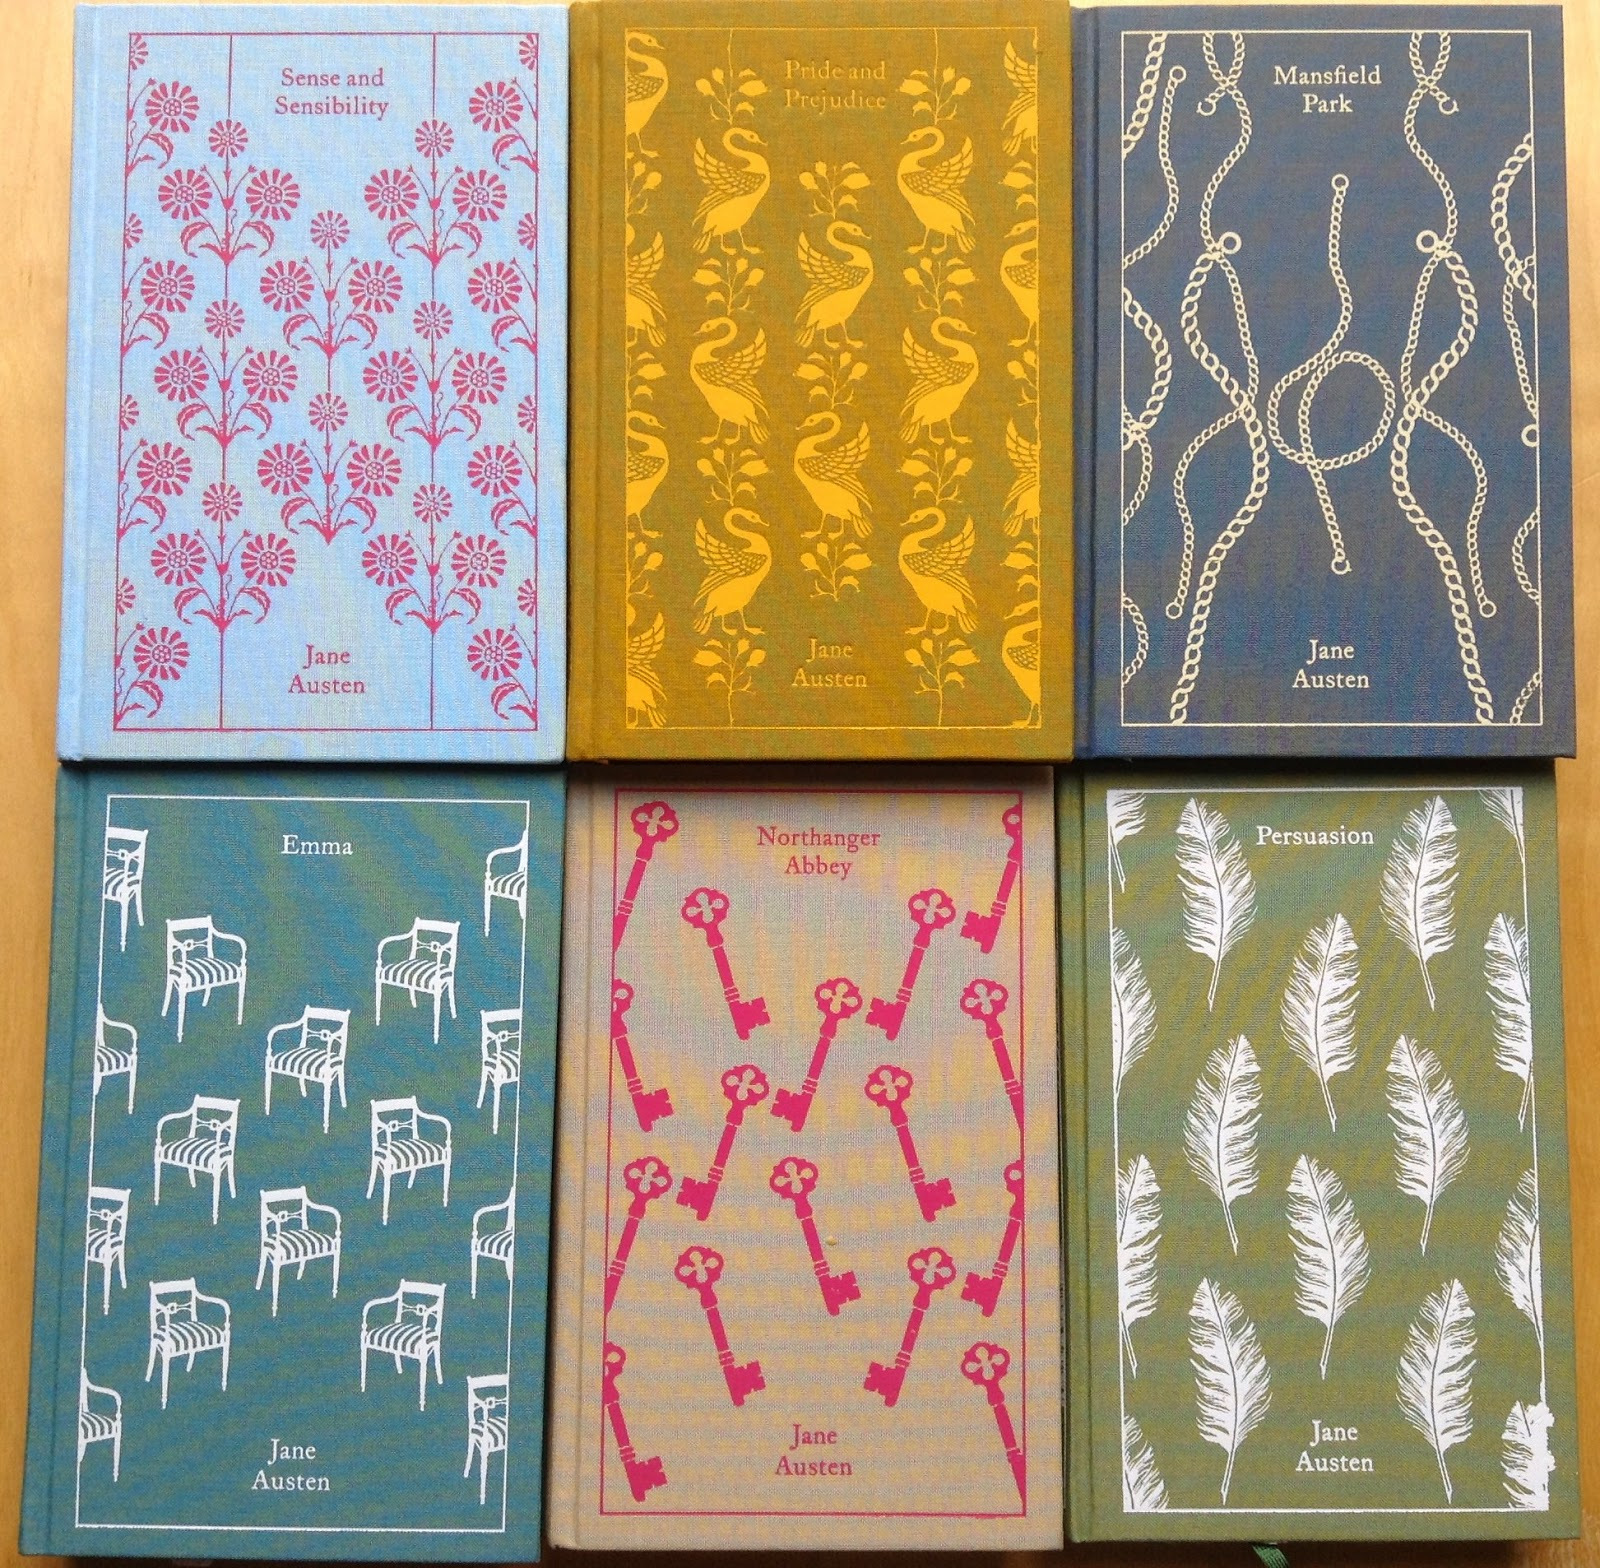 Jane Austen Pretty Book Covers : Babblings of a bookworm september